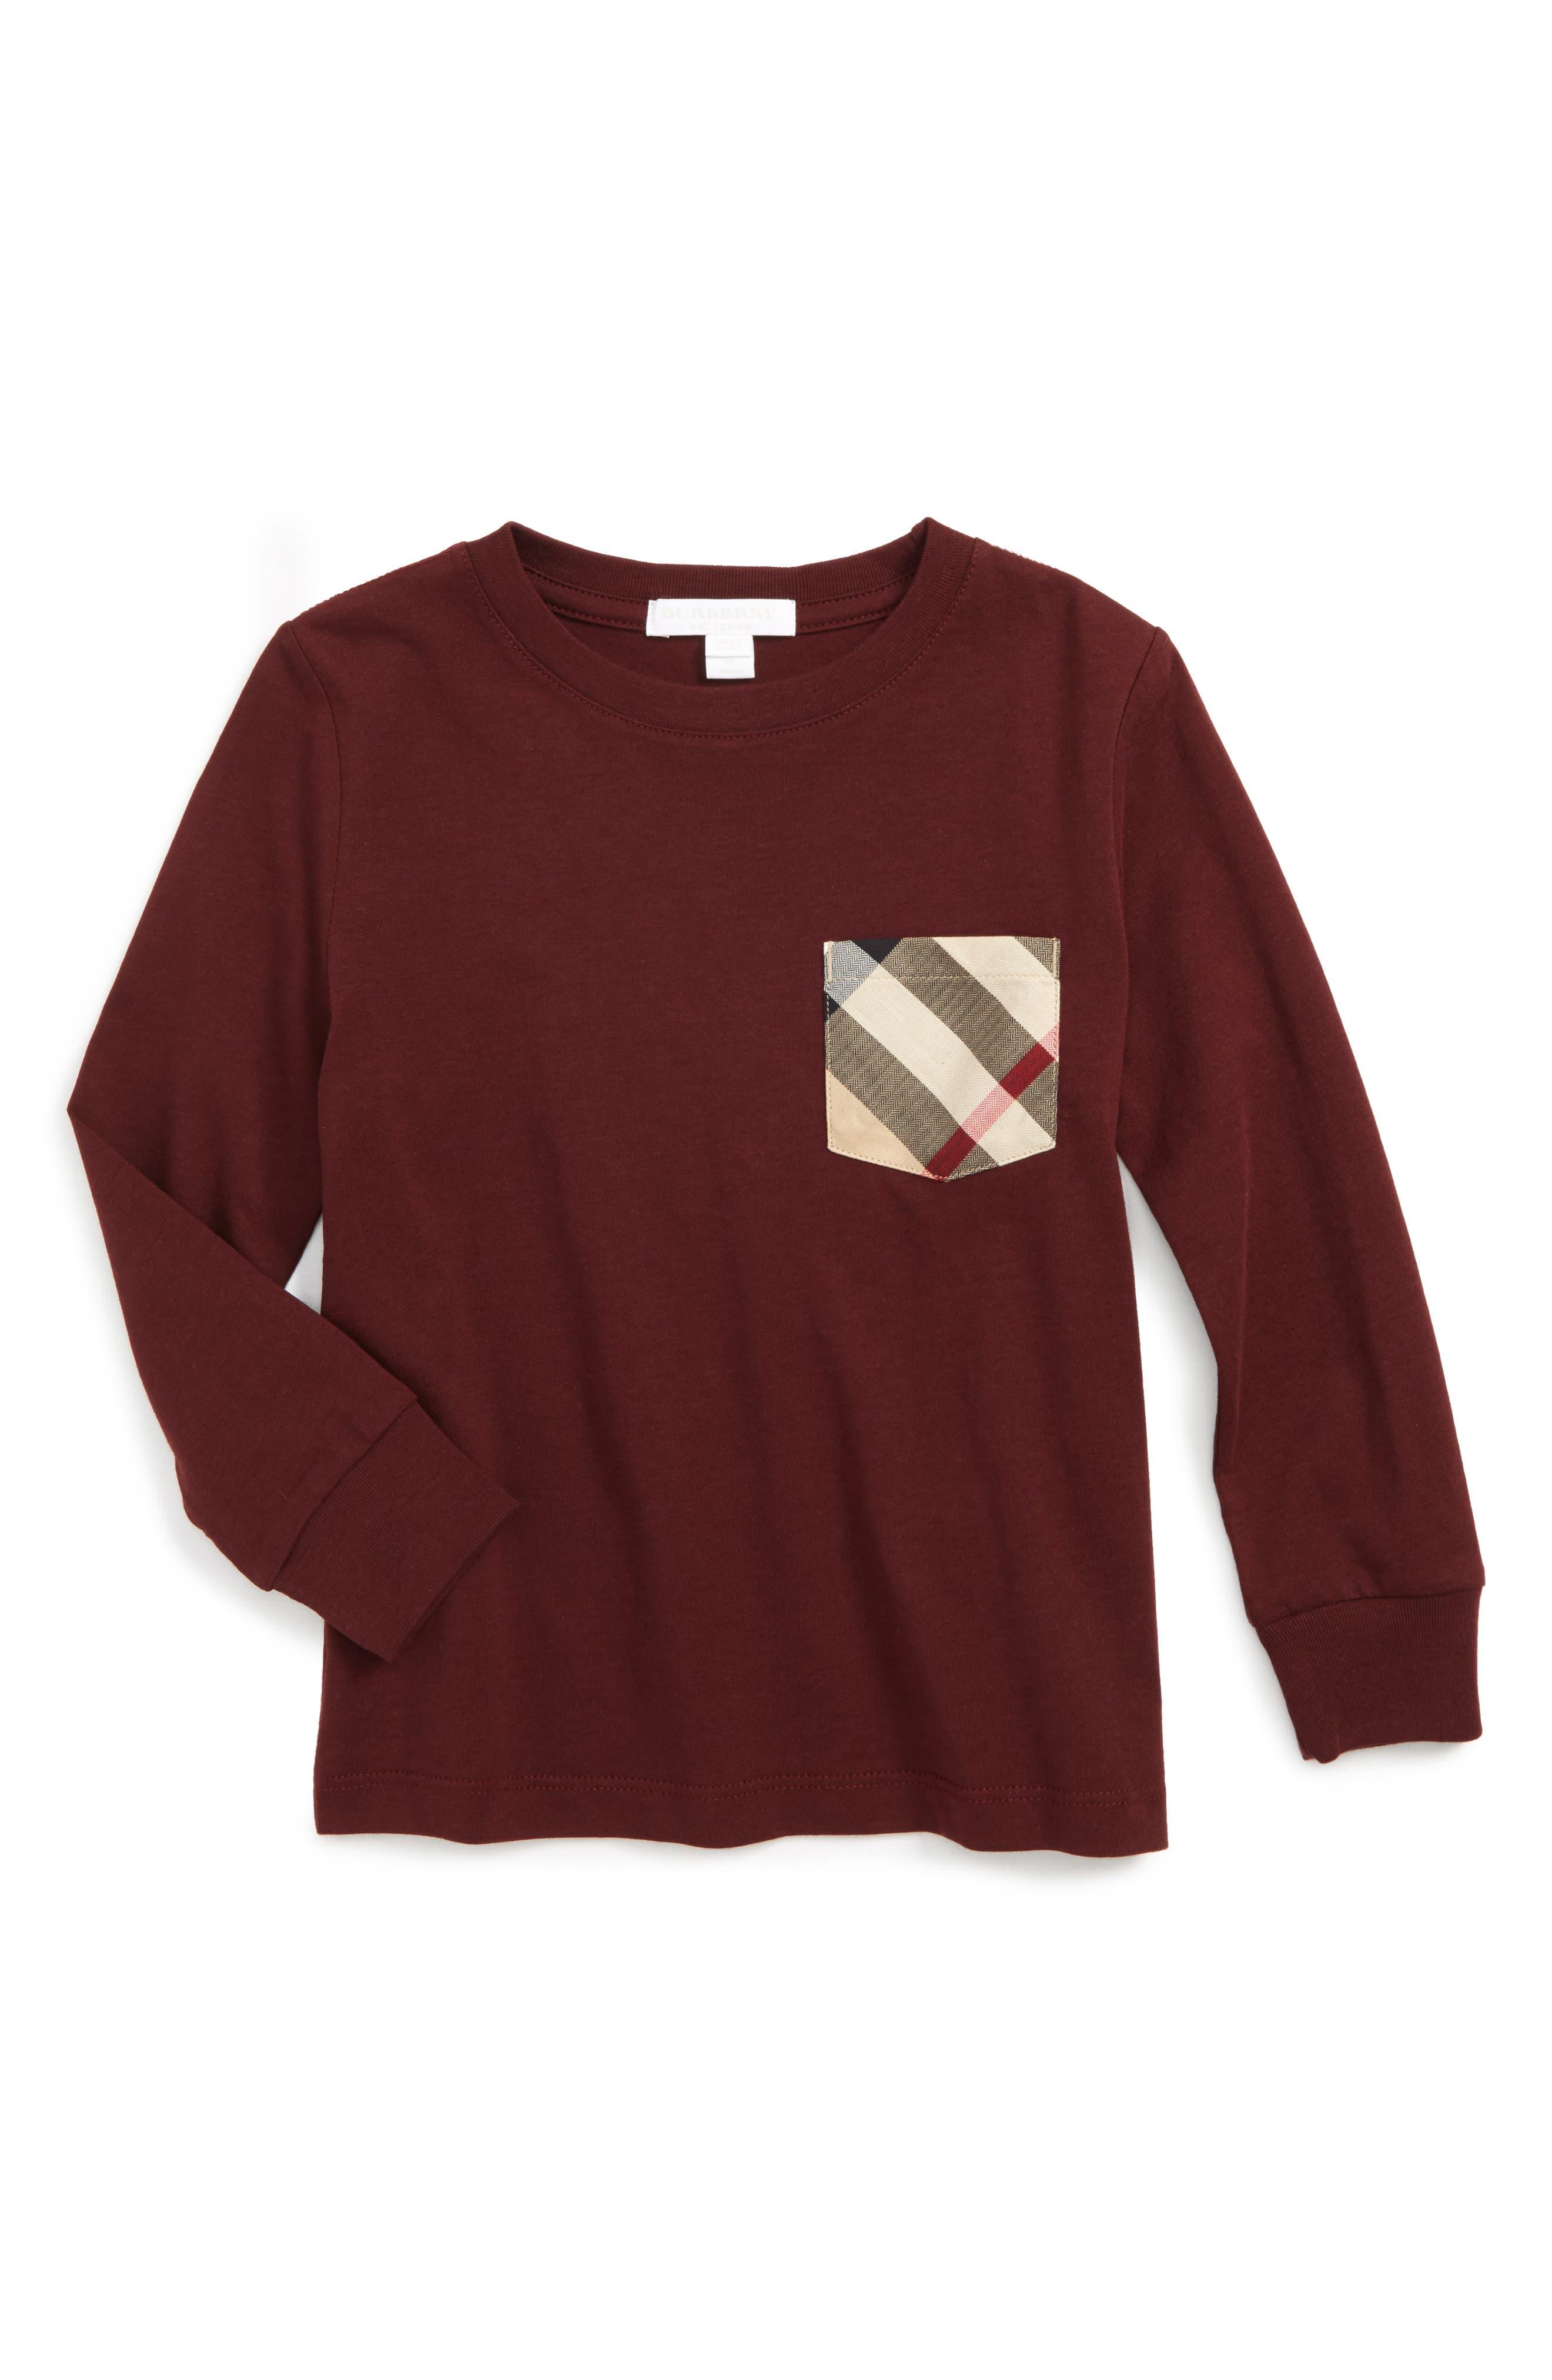 Burberry Check Print Chest Pocket T-Shirt(Little Boys & Big Boys)